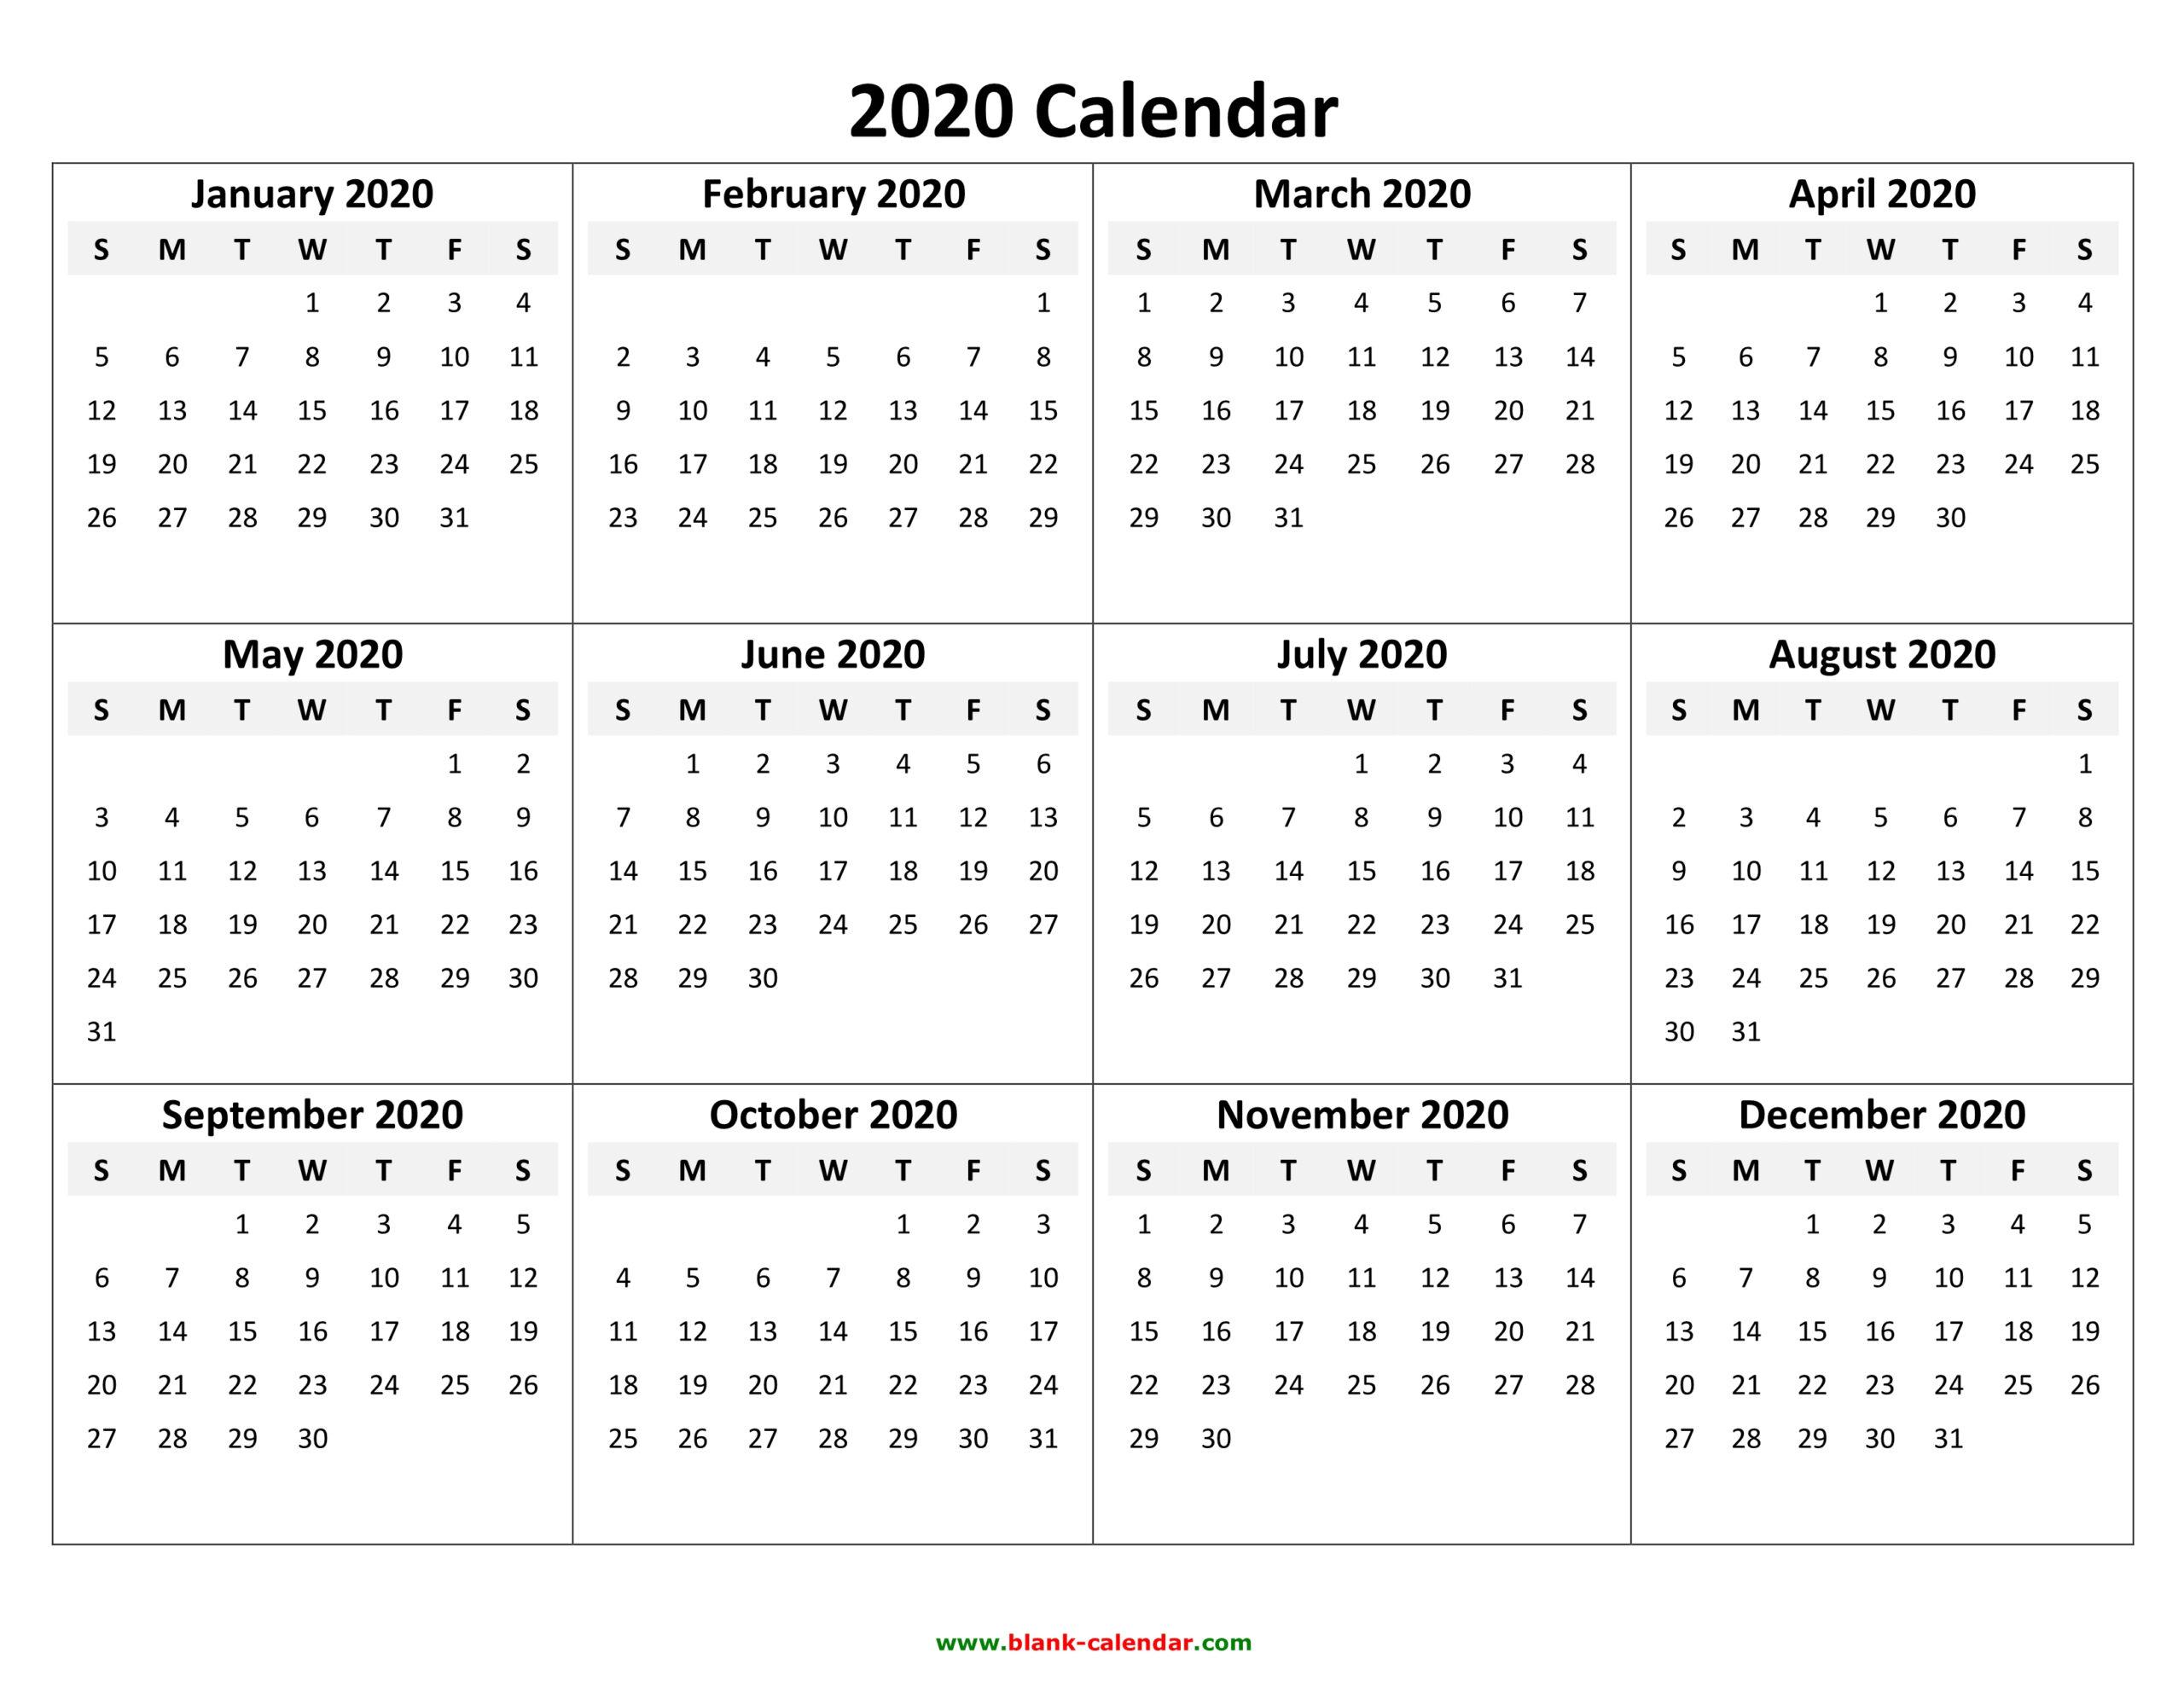 Free Yearly Printable Calendar 2020 Mesi Rsd7 Org